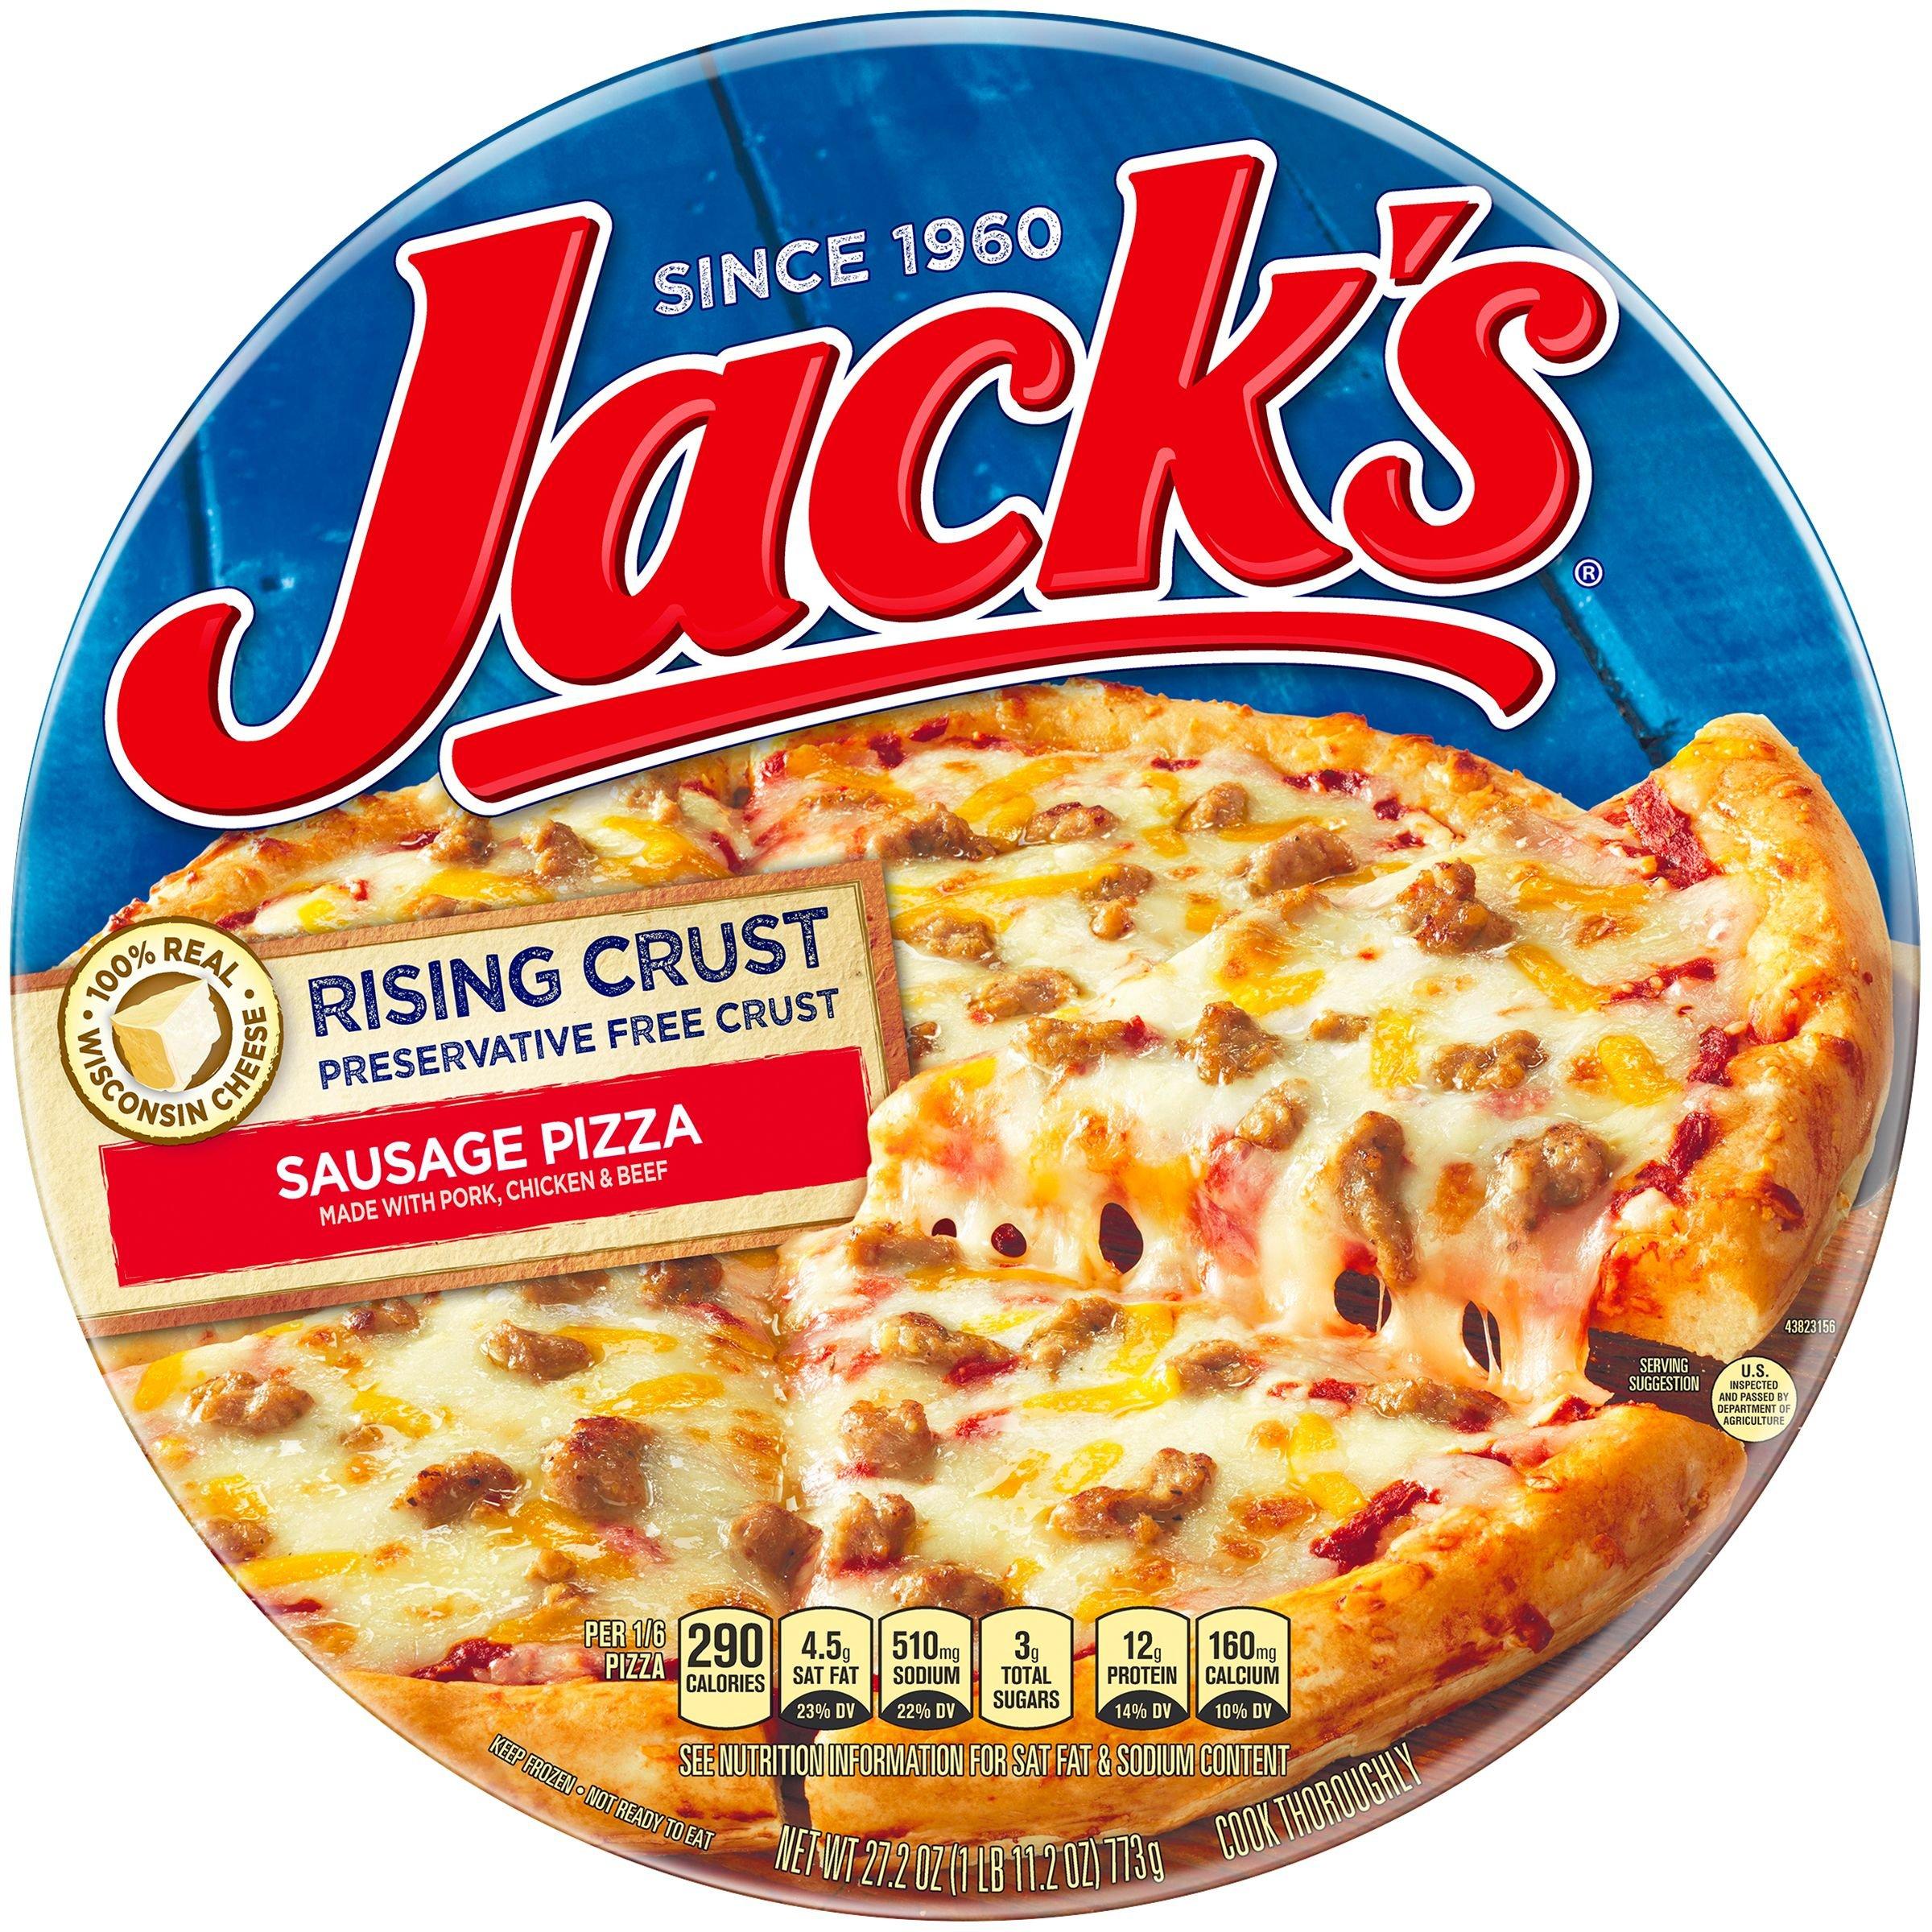 Jack's, Rising Crust, Sausage, 27.2 oz. (12 count)